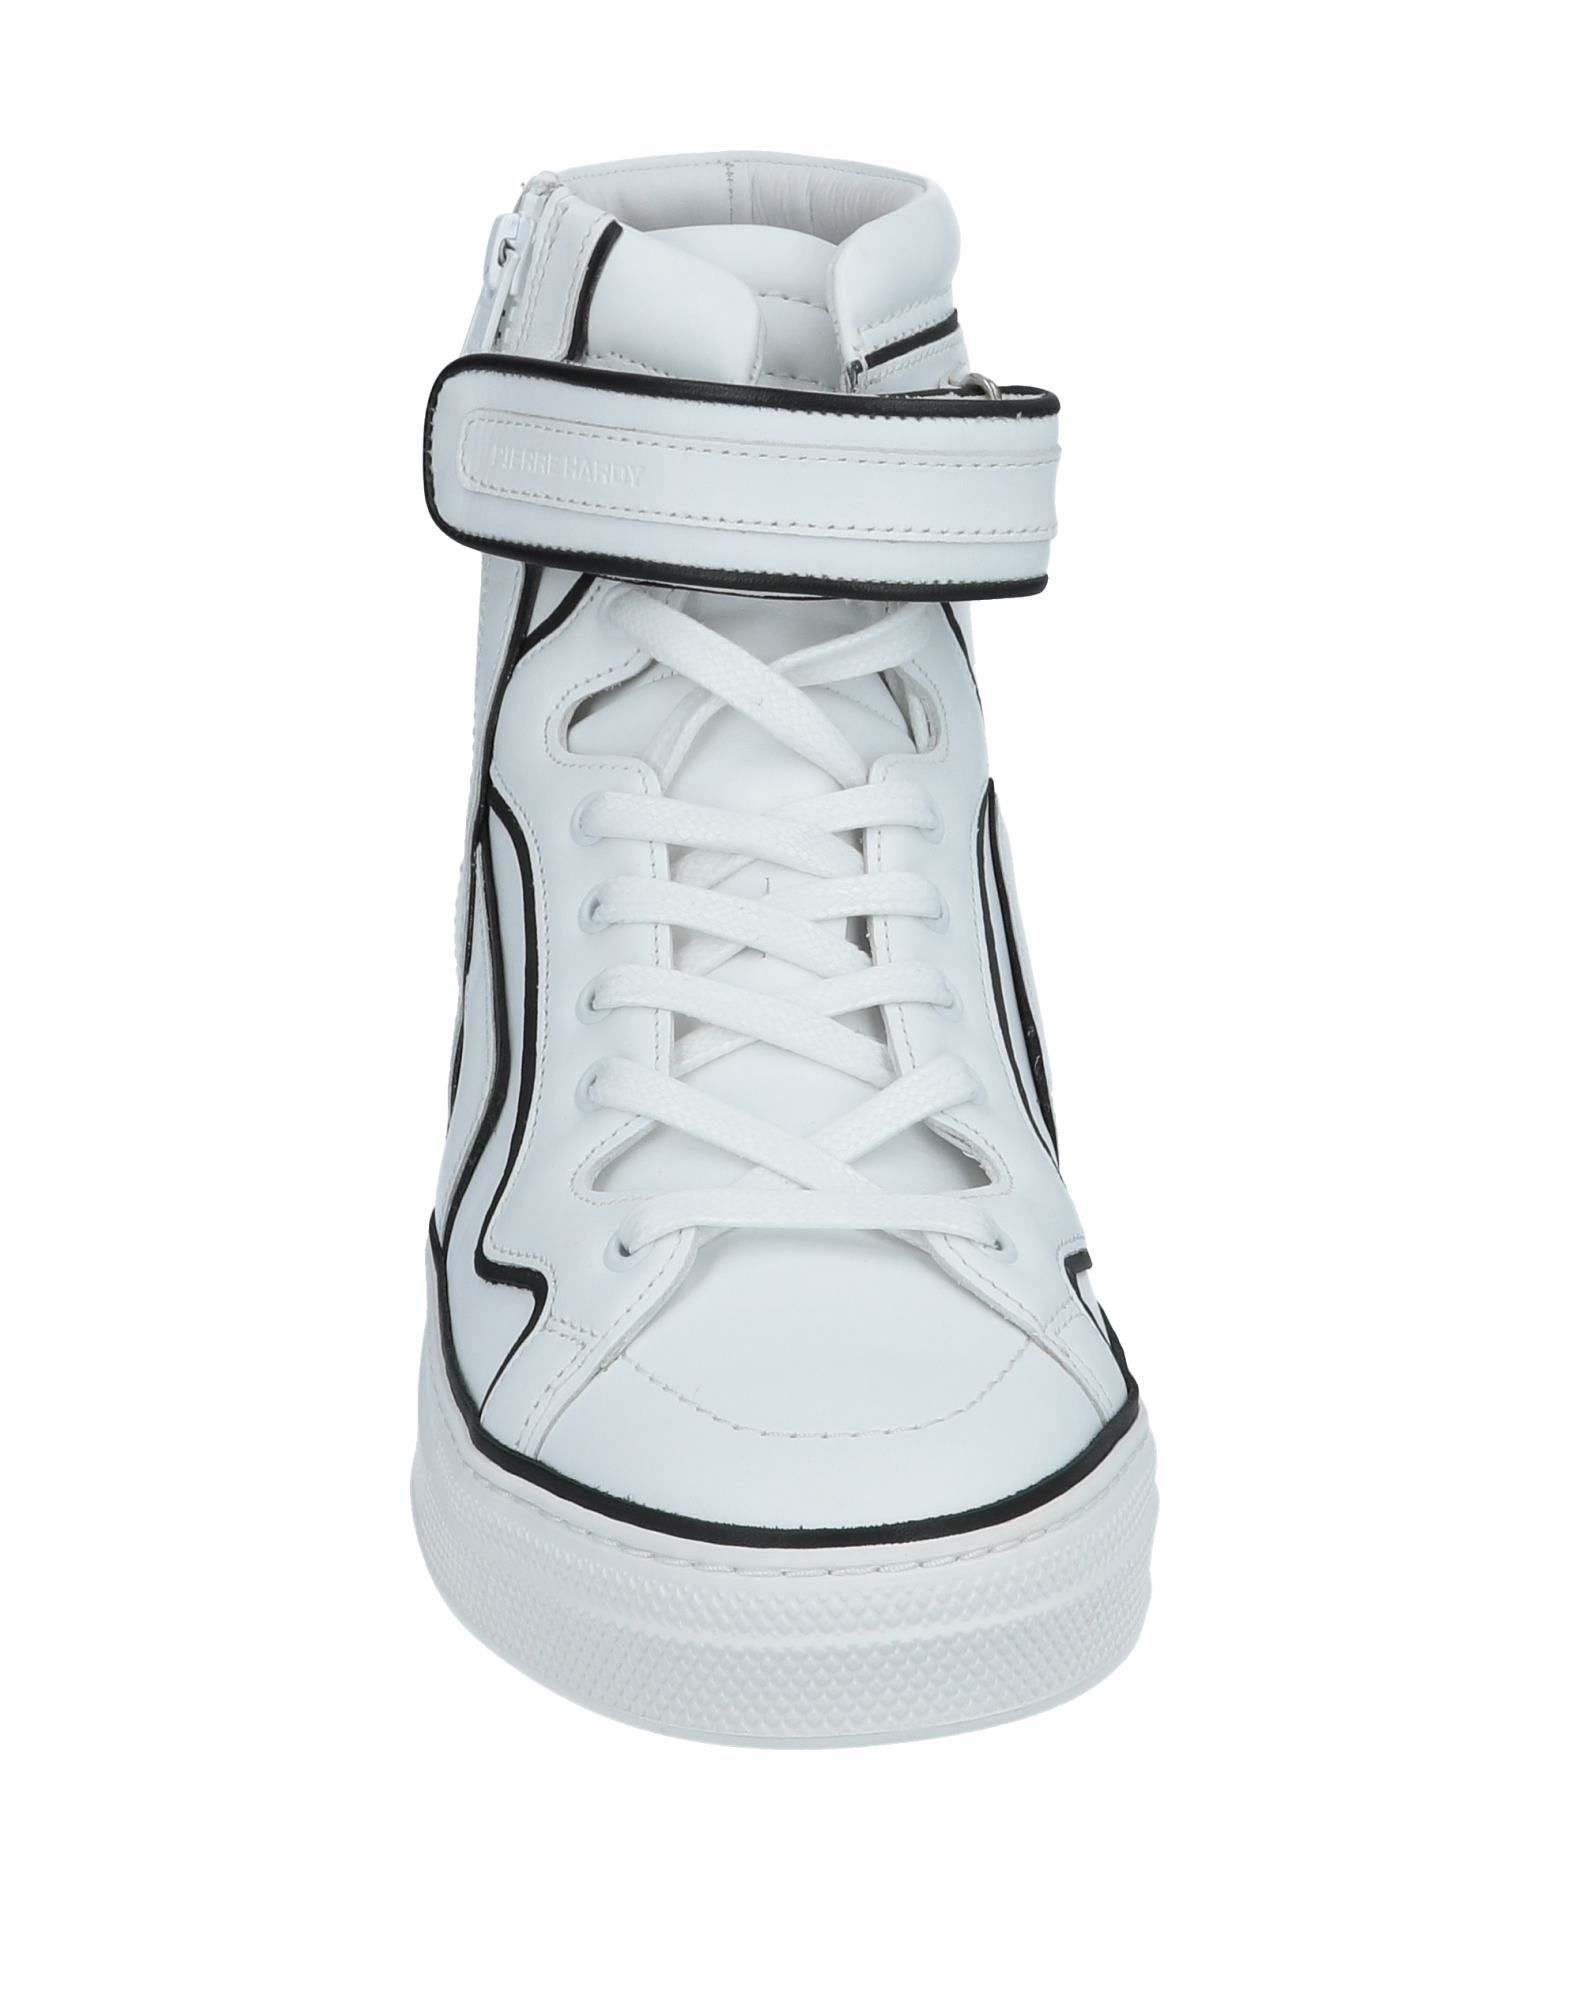 Pierre Pierre Pierre Hardy Sneakers Herren Gutes Preis-Leistungs-Verhältnis, es lohnt sich 721b1a